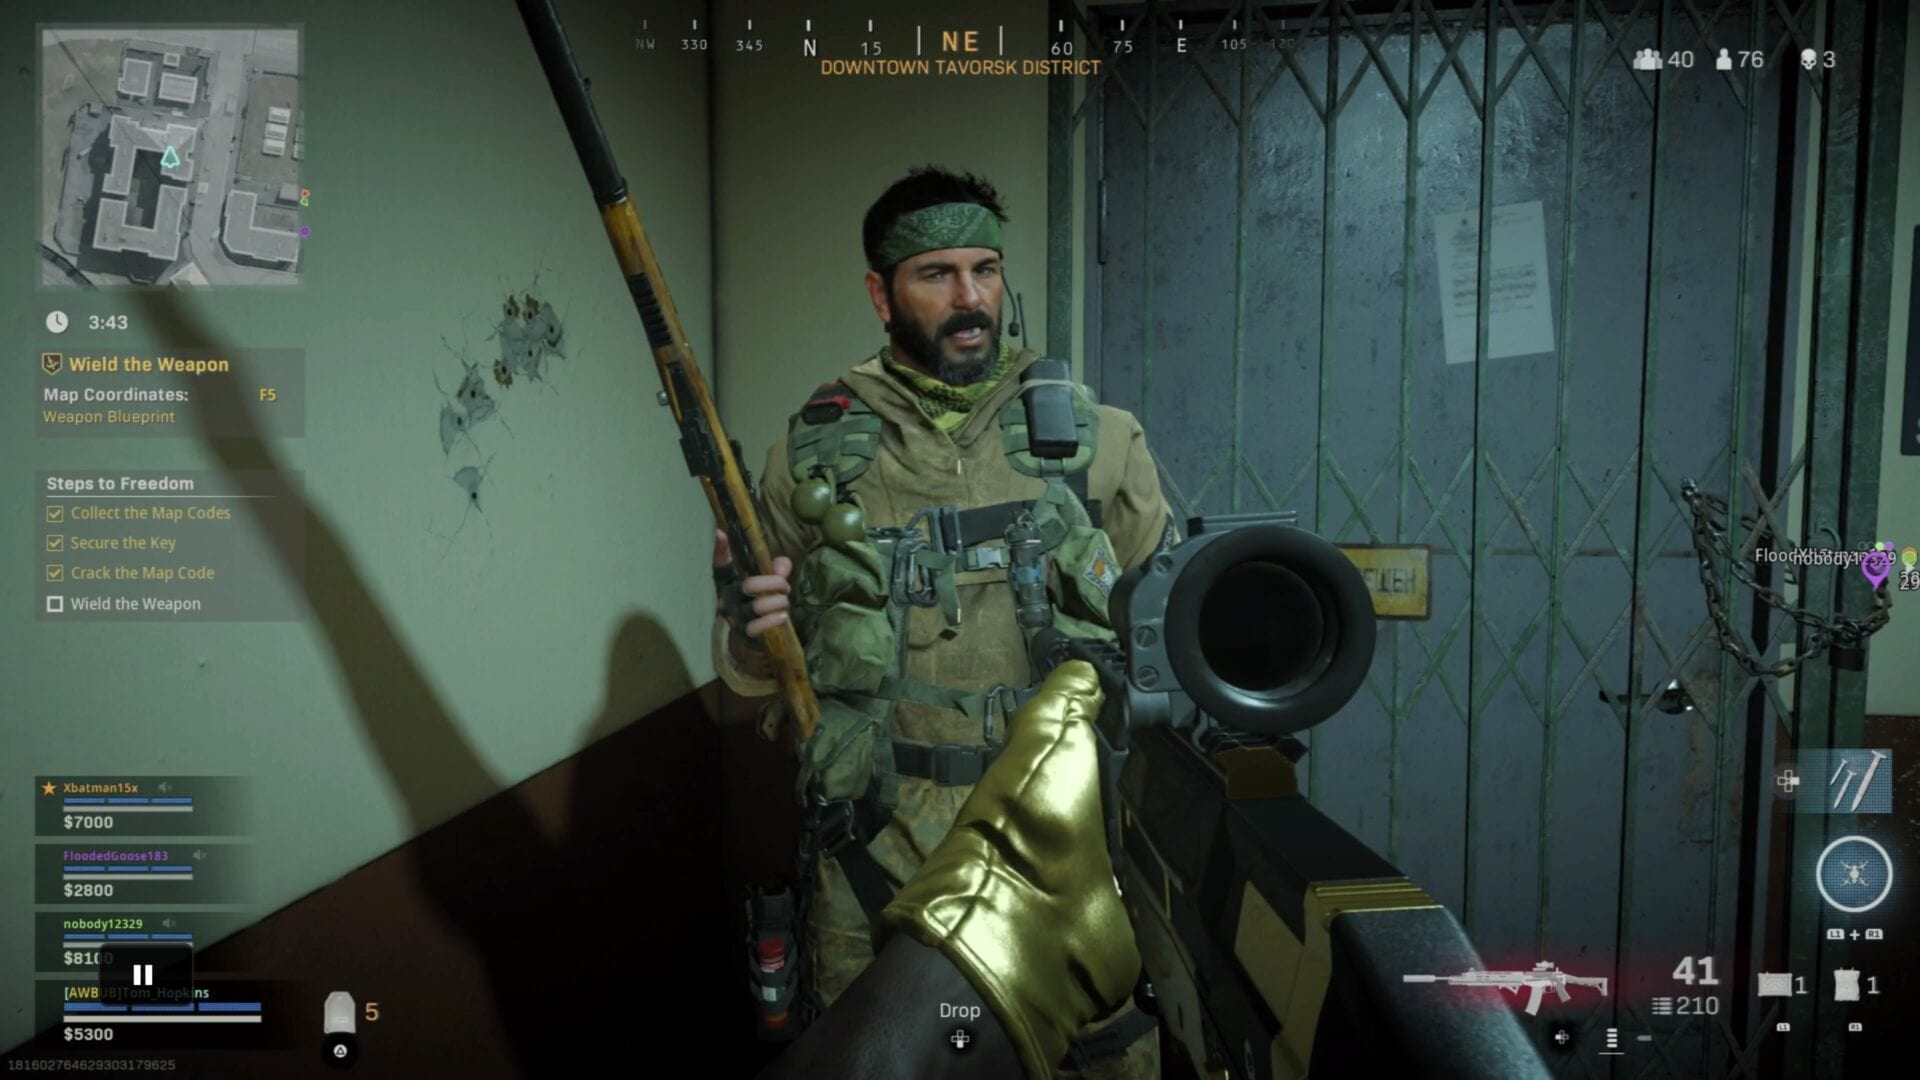 Call of Duty Broadband Record